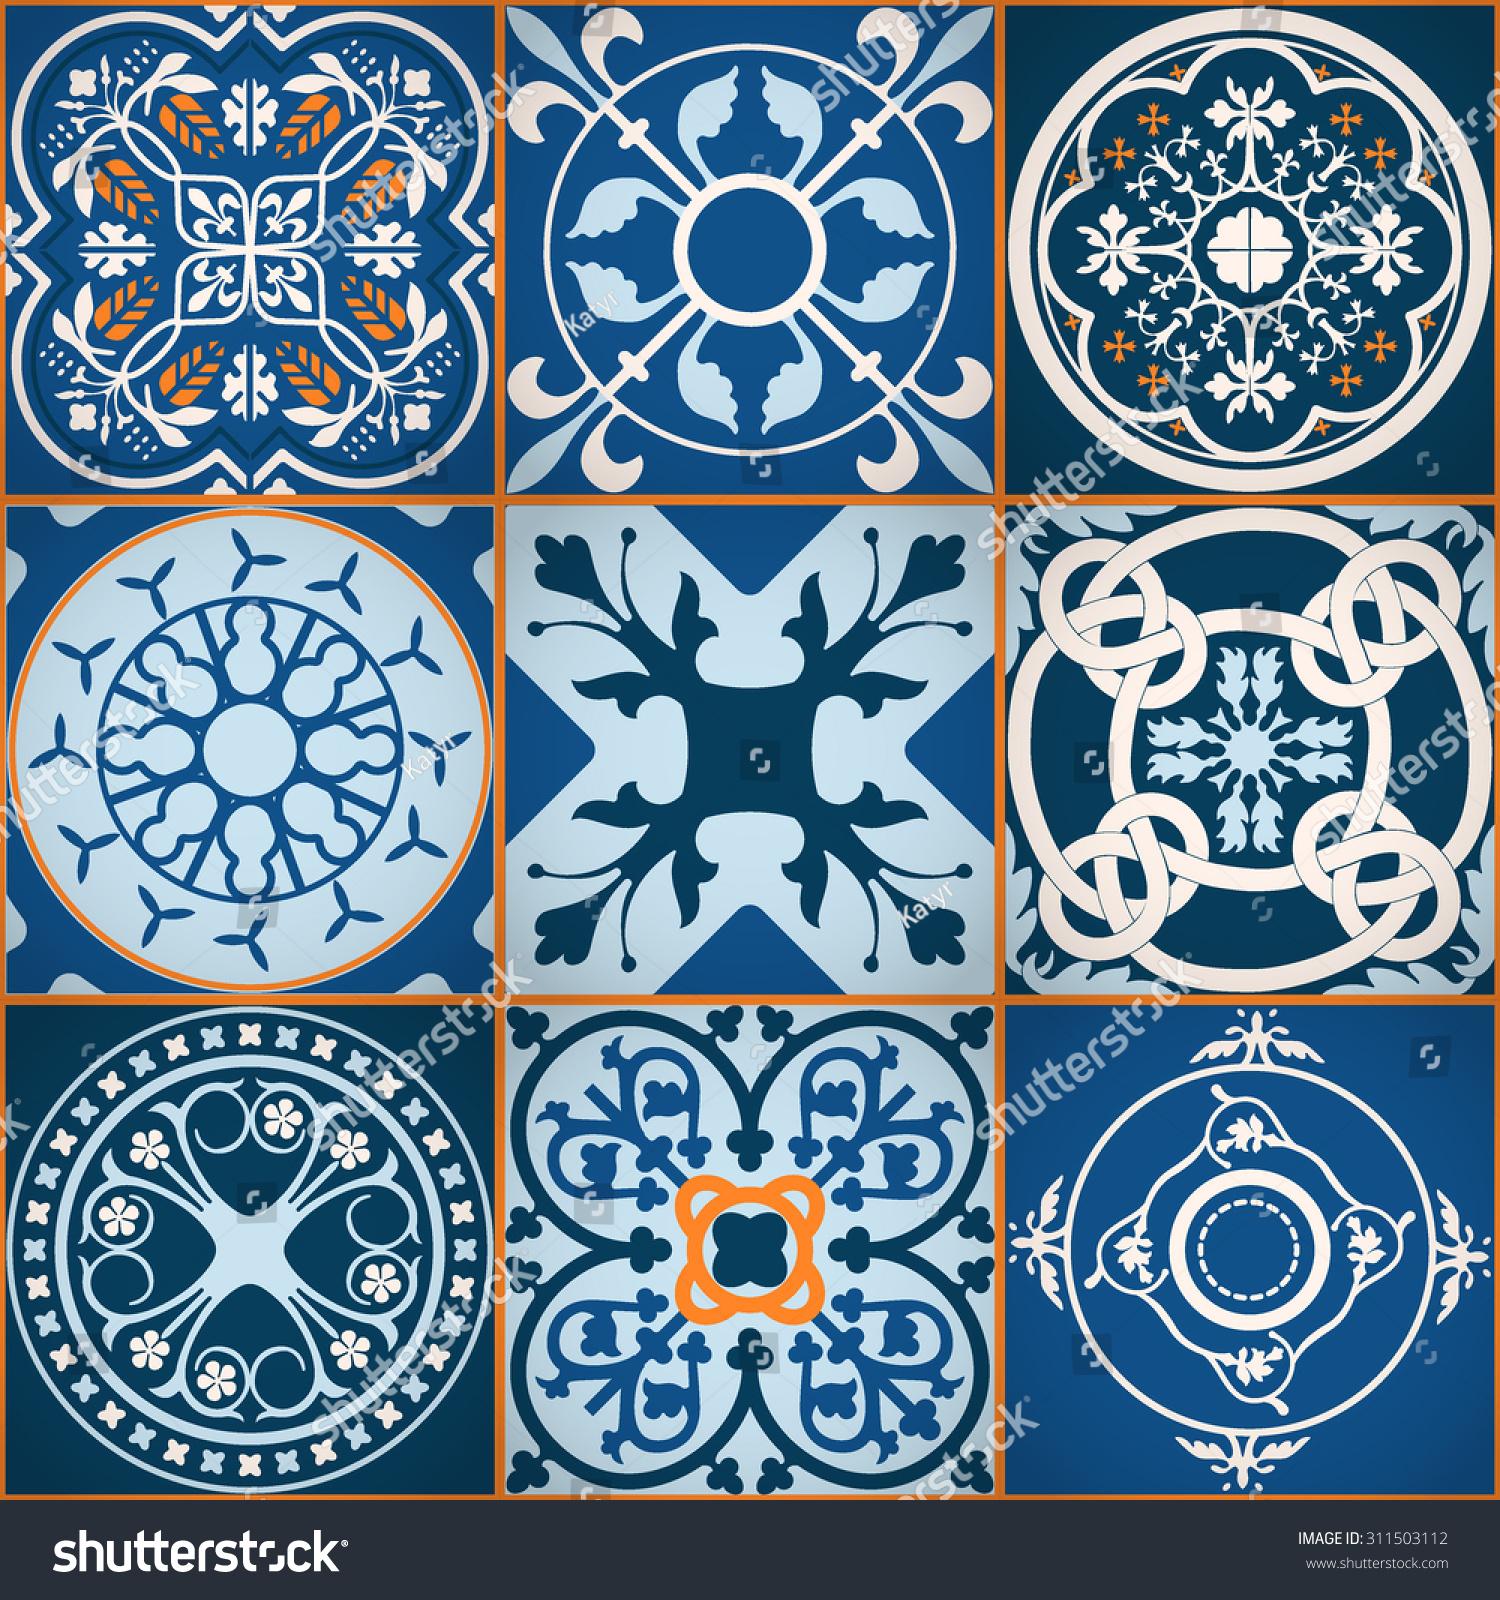 Vector of moroccan tile seamless pattern tile for design tile - Vector Illustration Of Moroccan Tiles Seamless Pattern For Design Website Background Banner